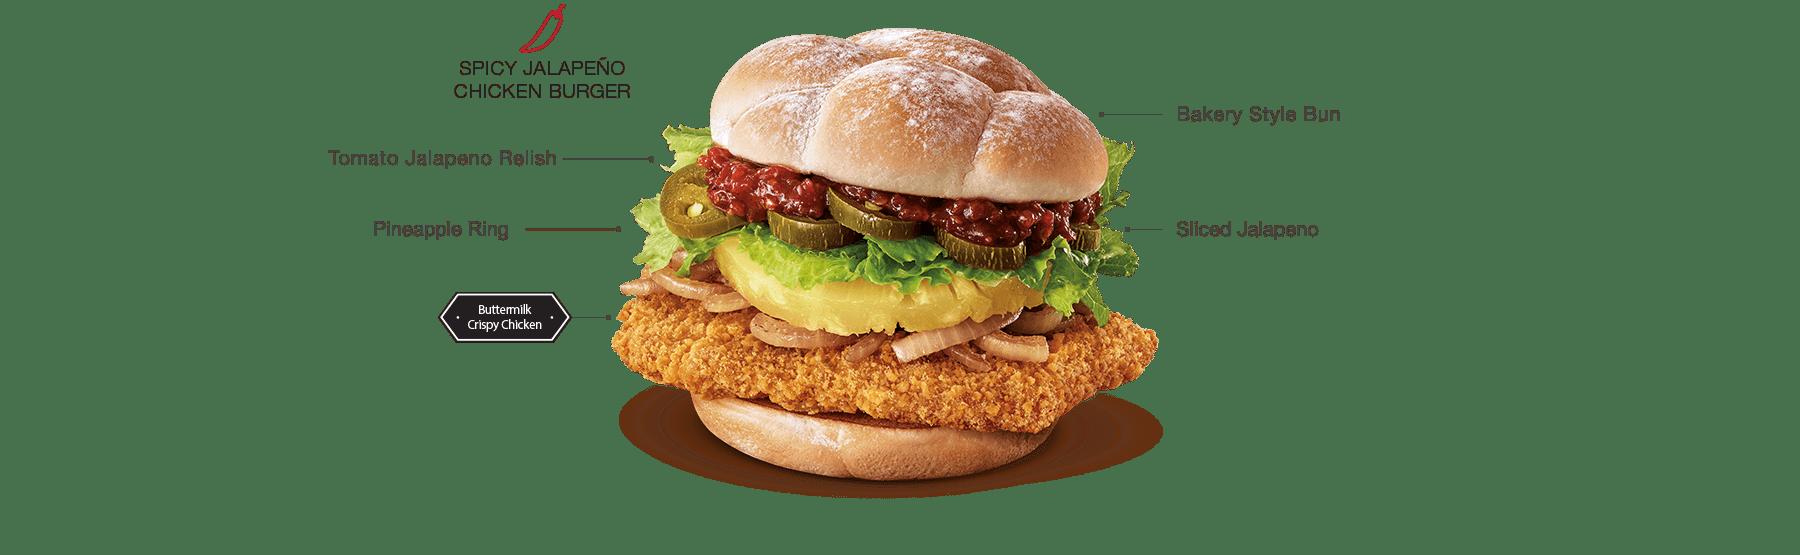 spicy-jalapeno-chicken-burger-mcdonalds